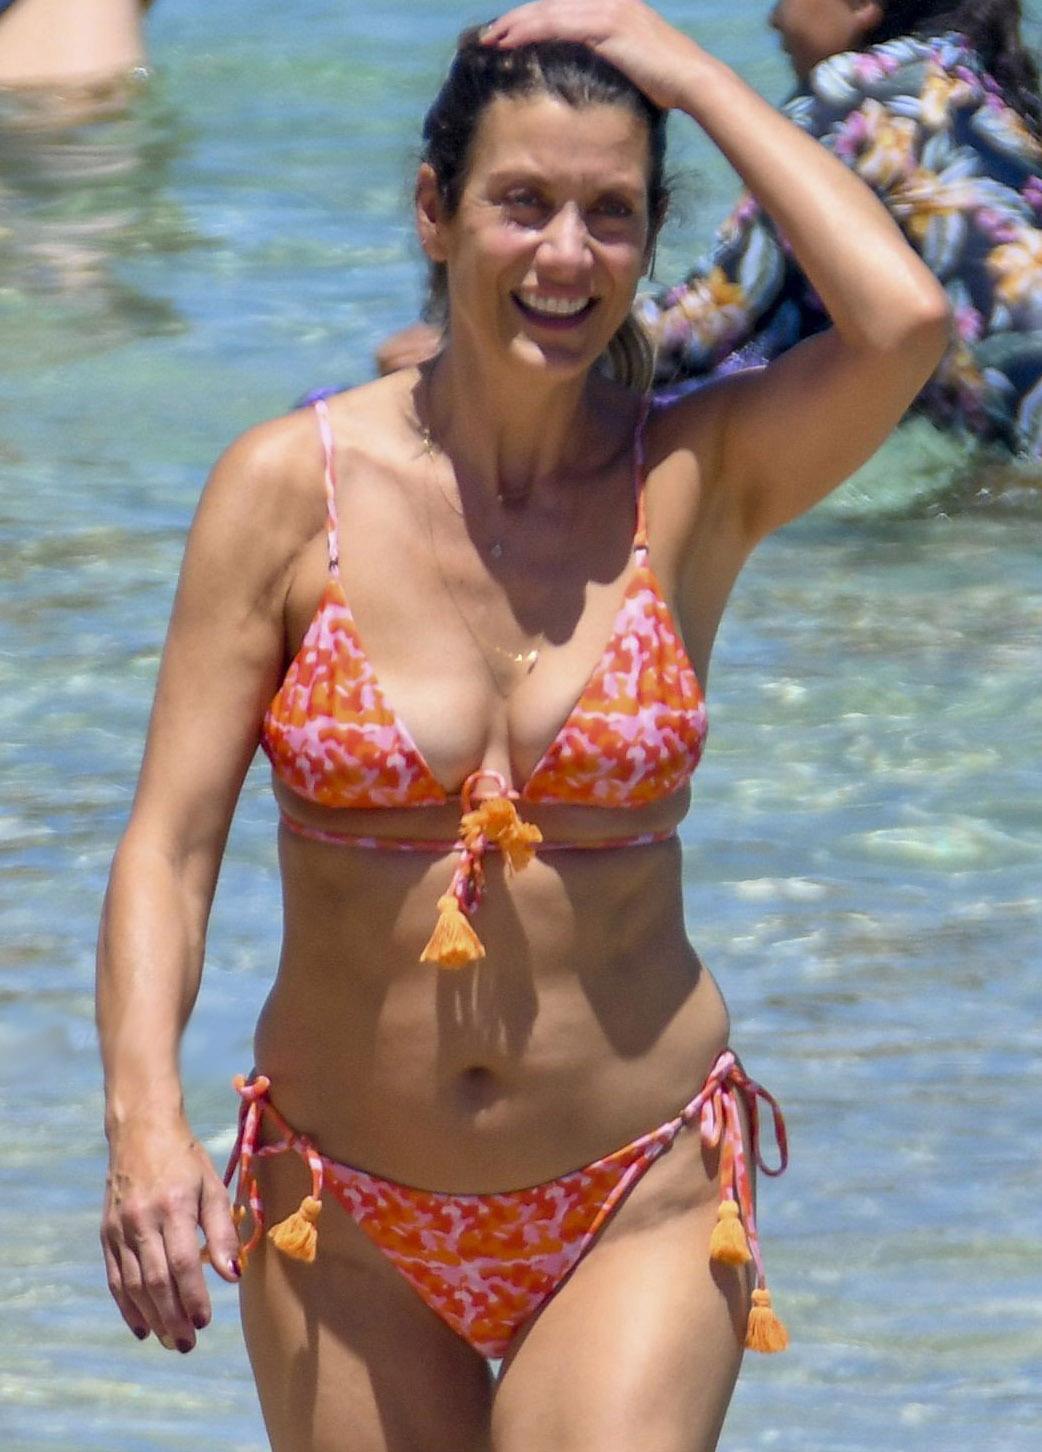 Kate Walsh Caught Tanning In Bikini On A Beach